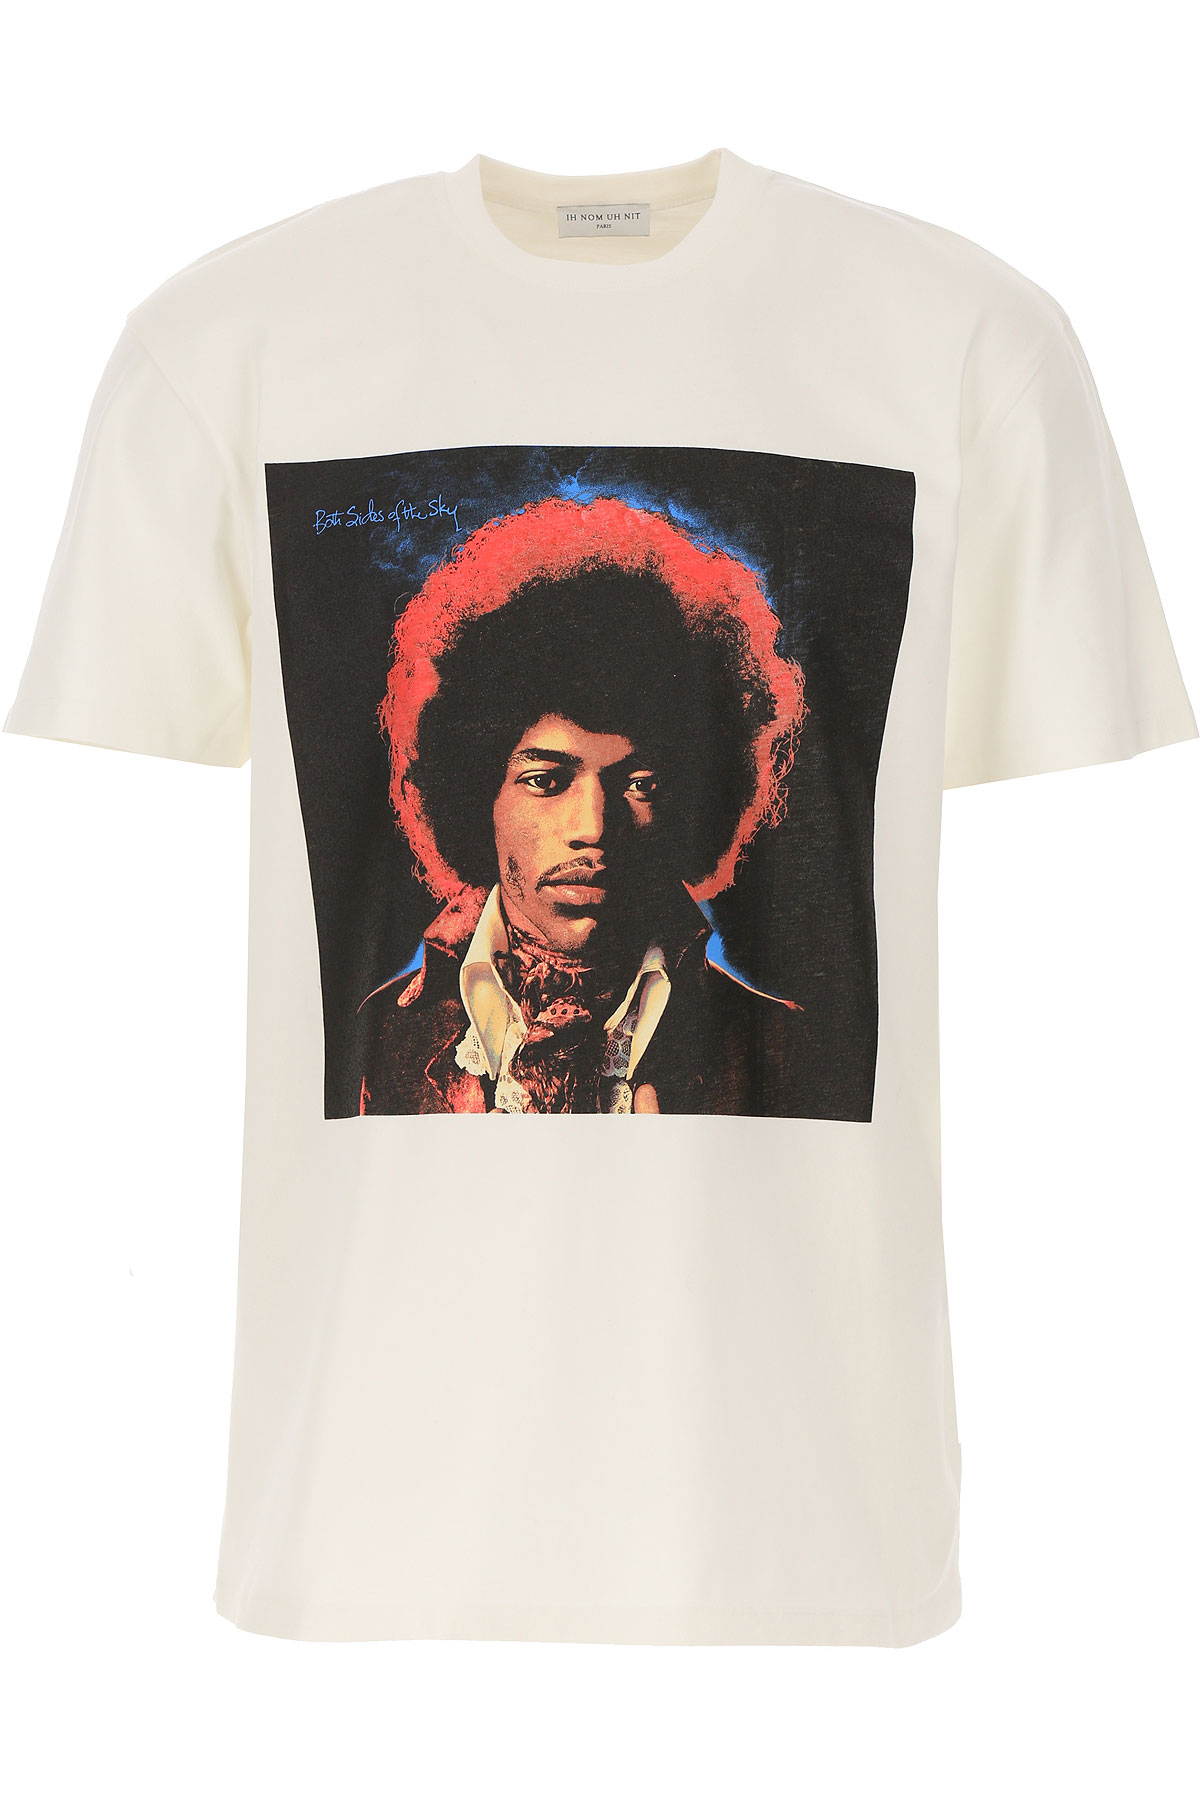 Ih Nom Uh Nit T-Shirt for Men On Sale, White, Cotton, 2019, L M S XL